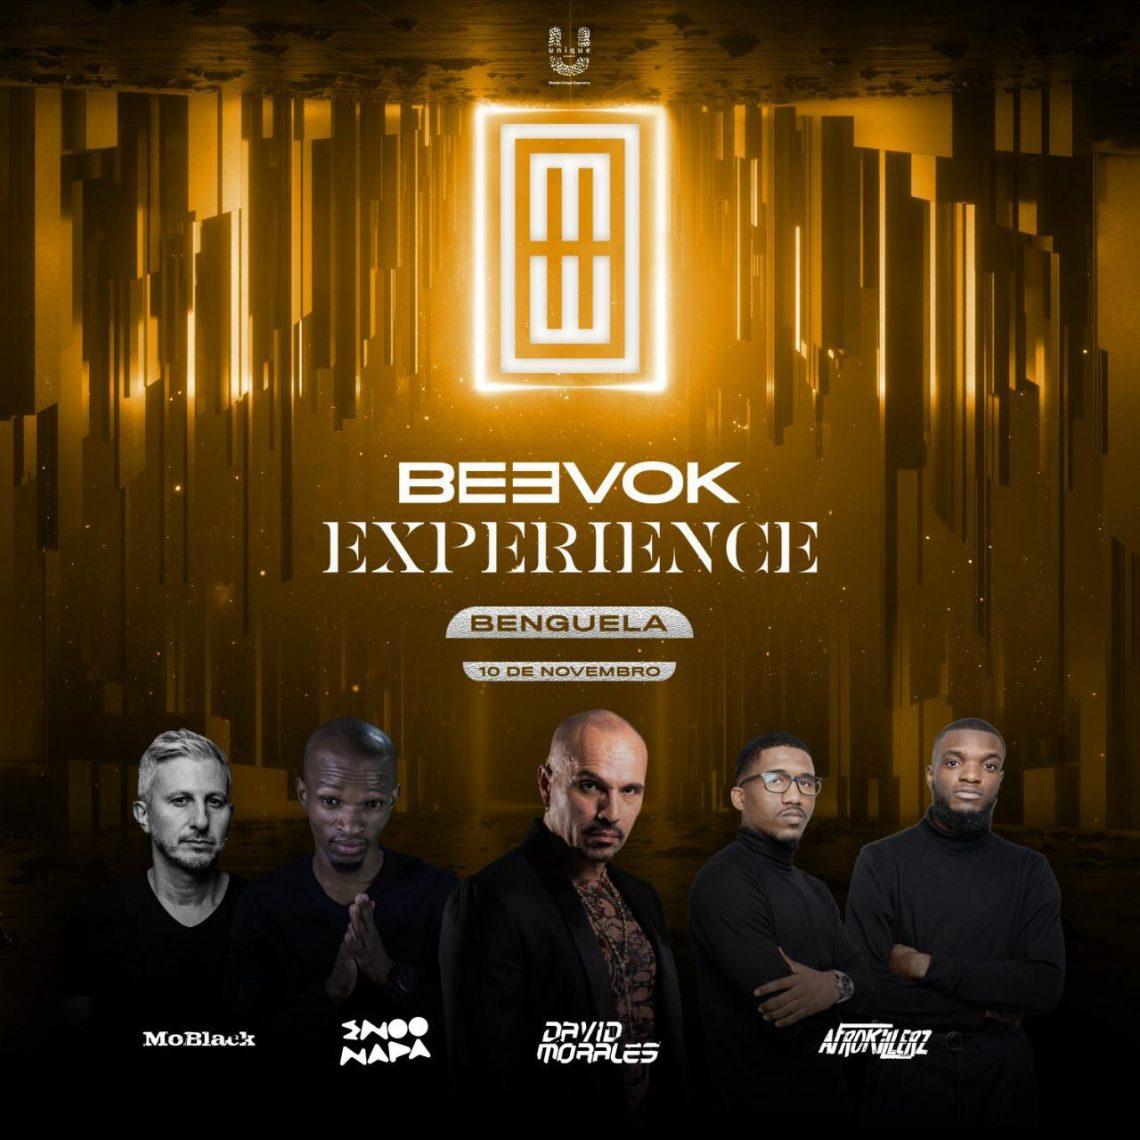 Beevok Experience – Benguela w/MoBlack